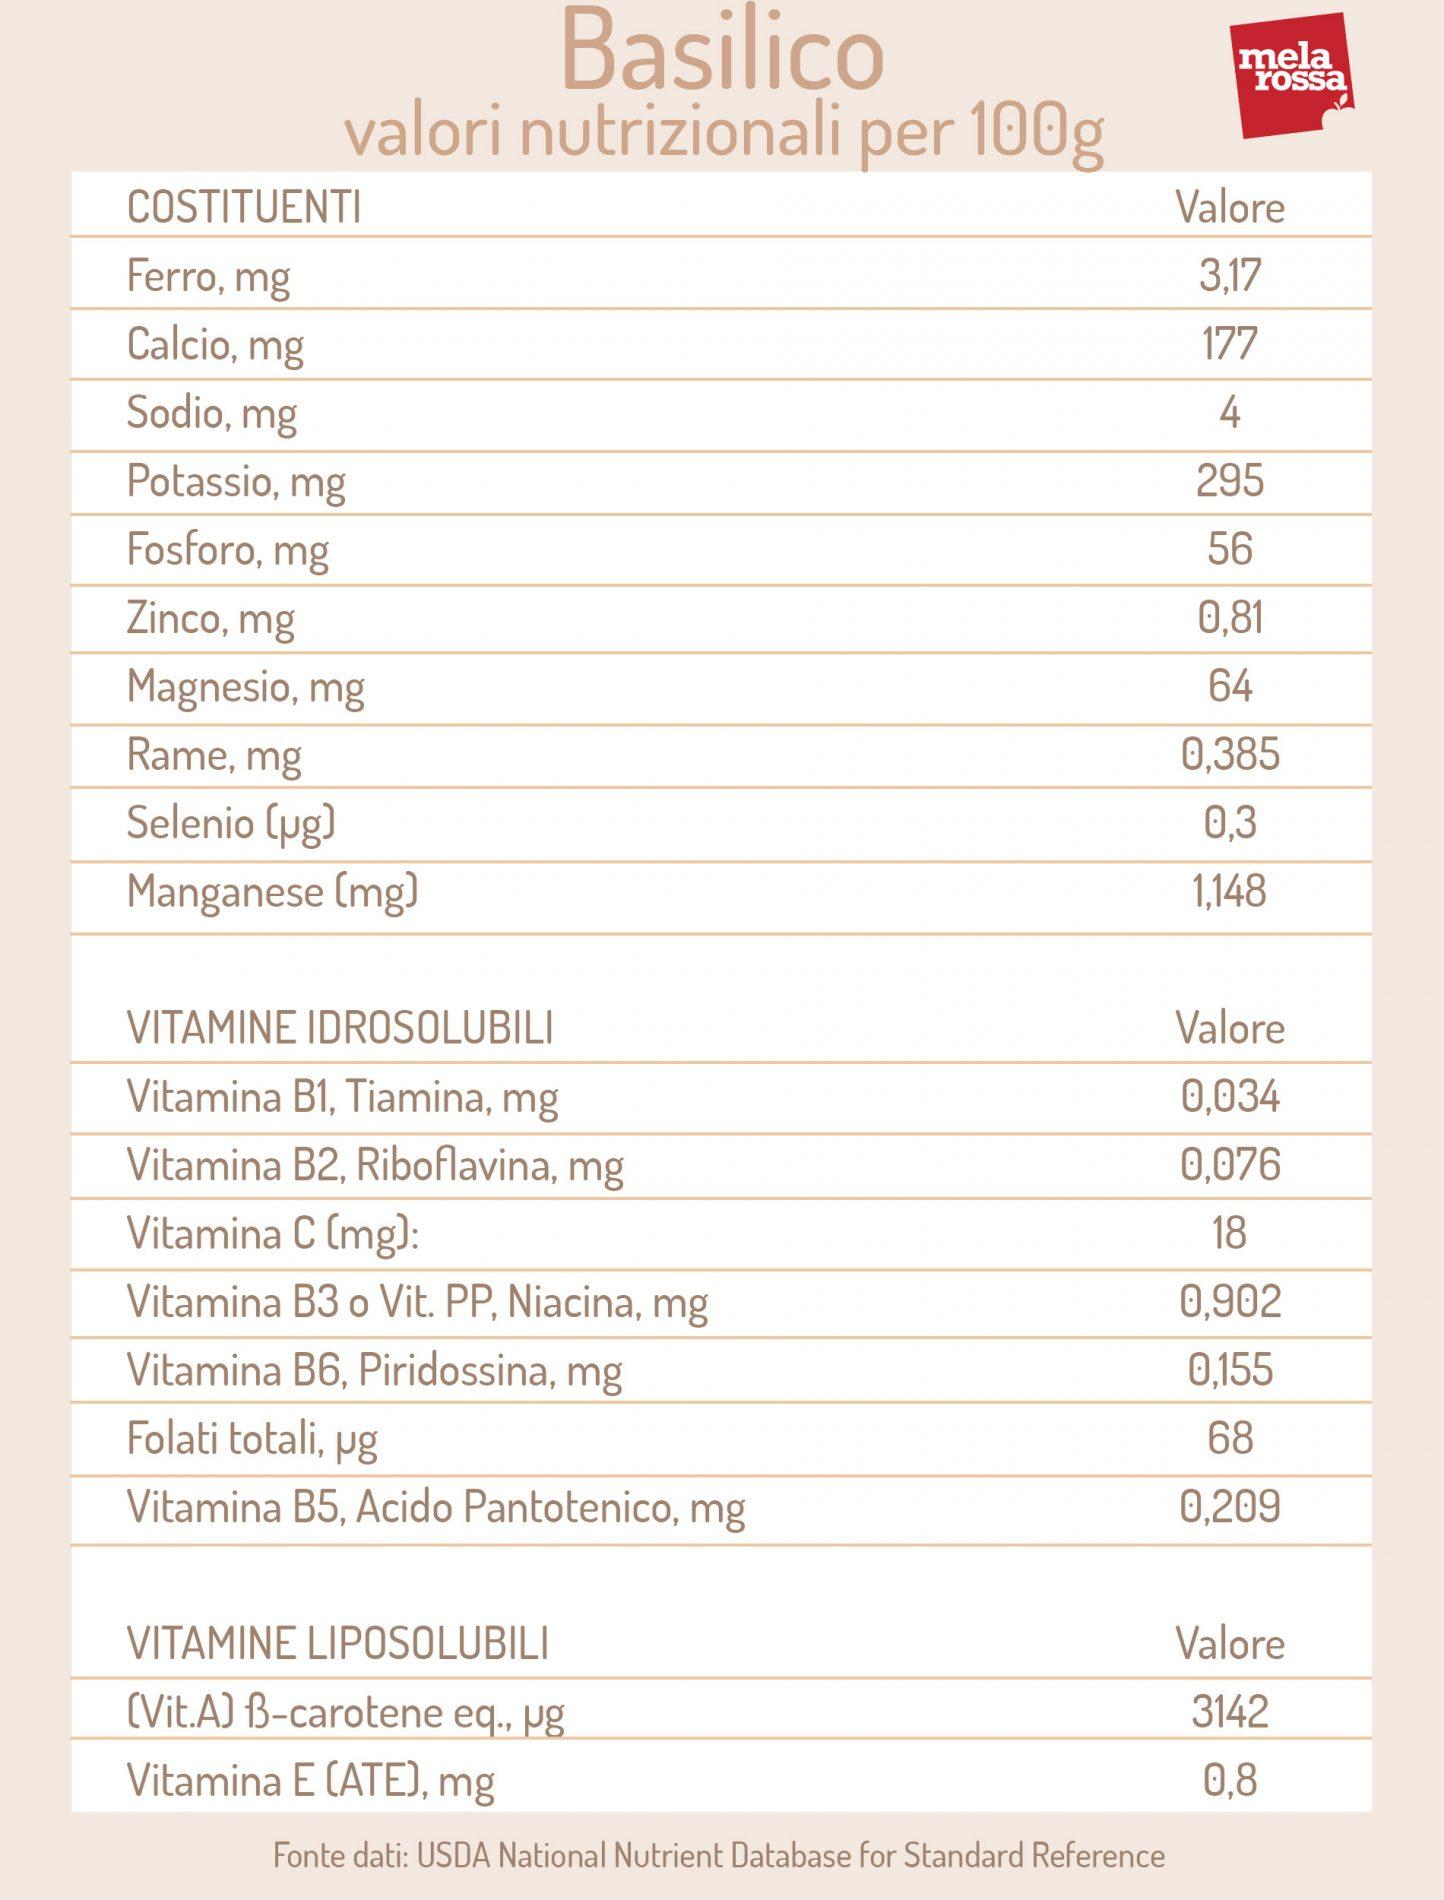 basilico: valori nutrizionali